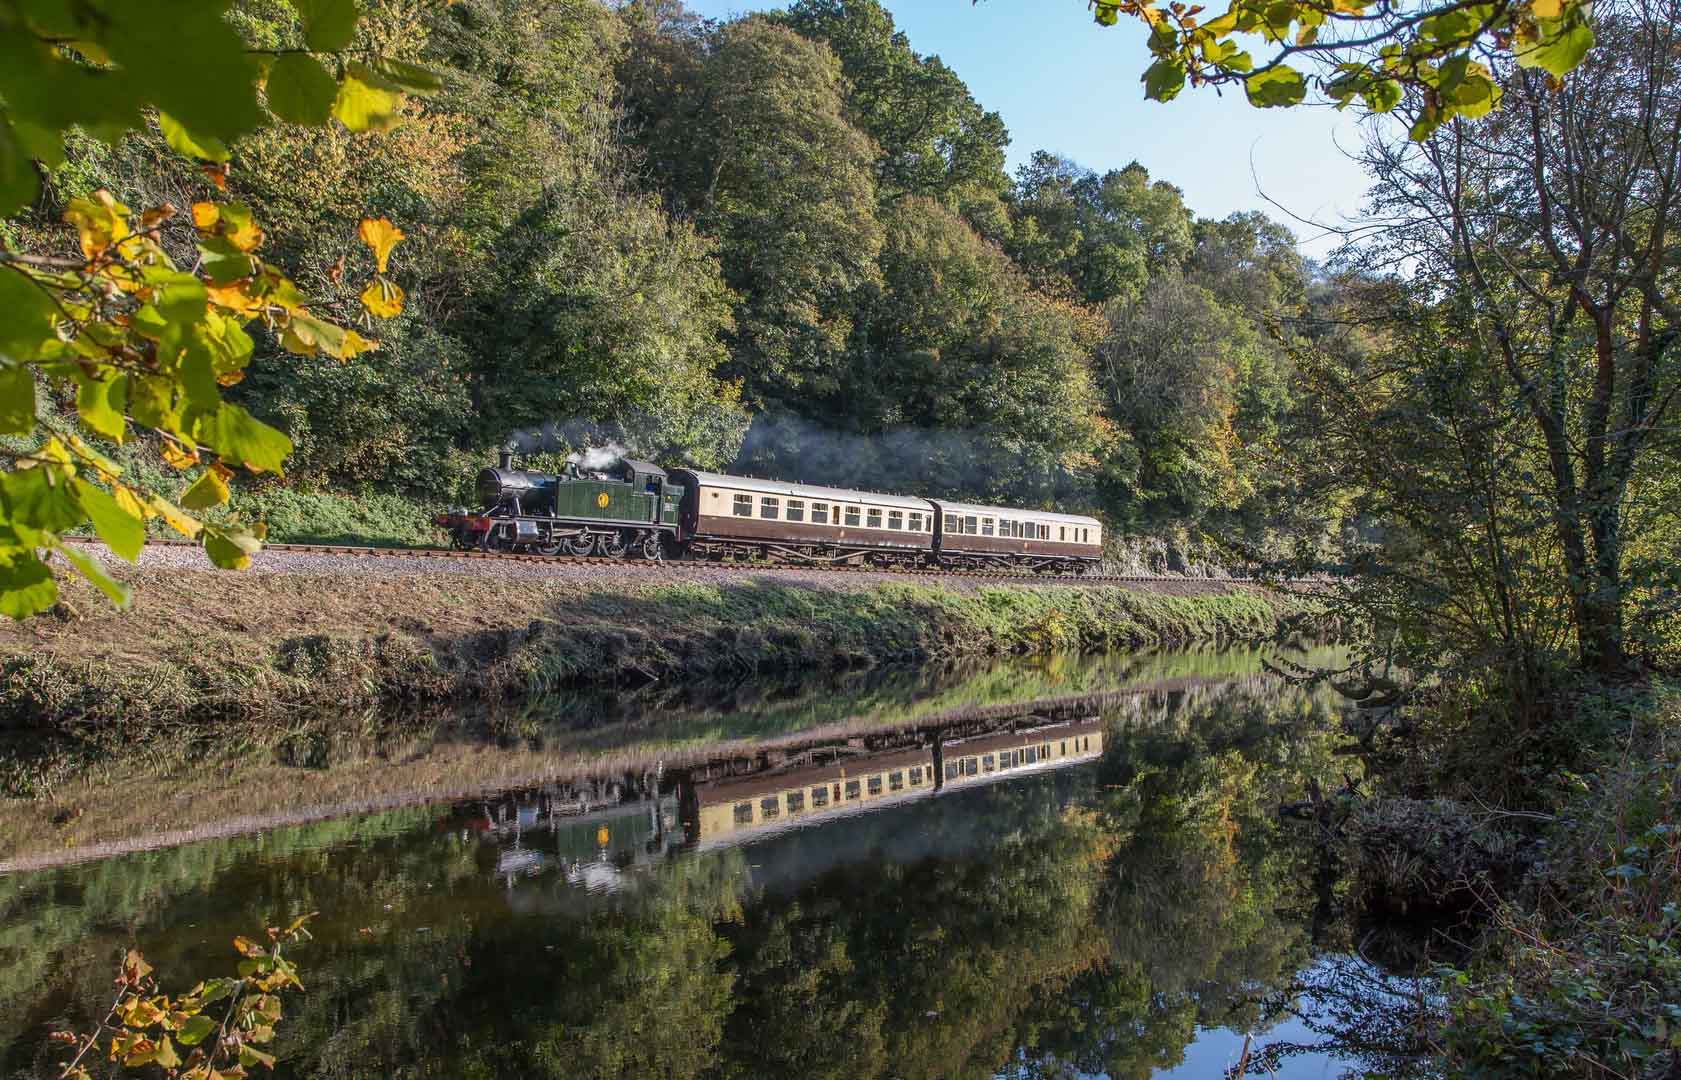 South-Devon-Railway-GWR-2-6-2T-No-5542-Colin-Wallace